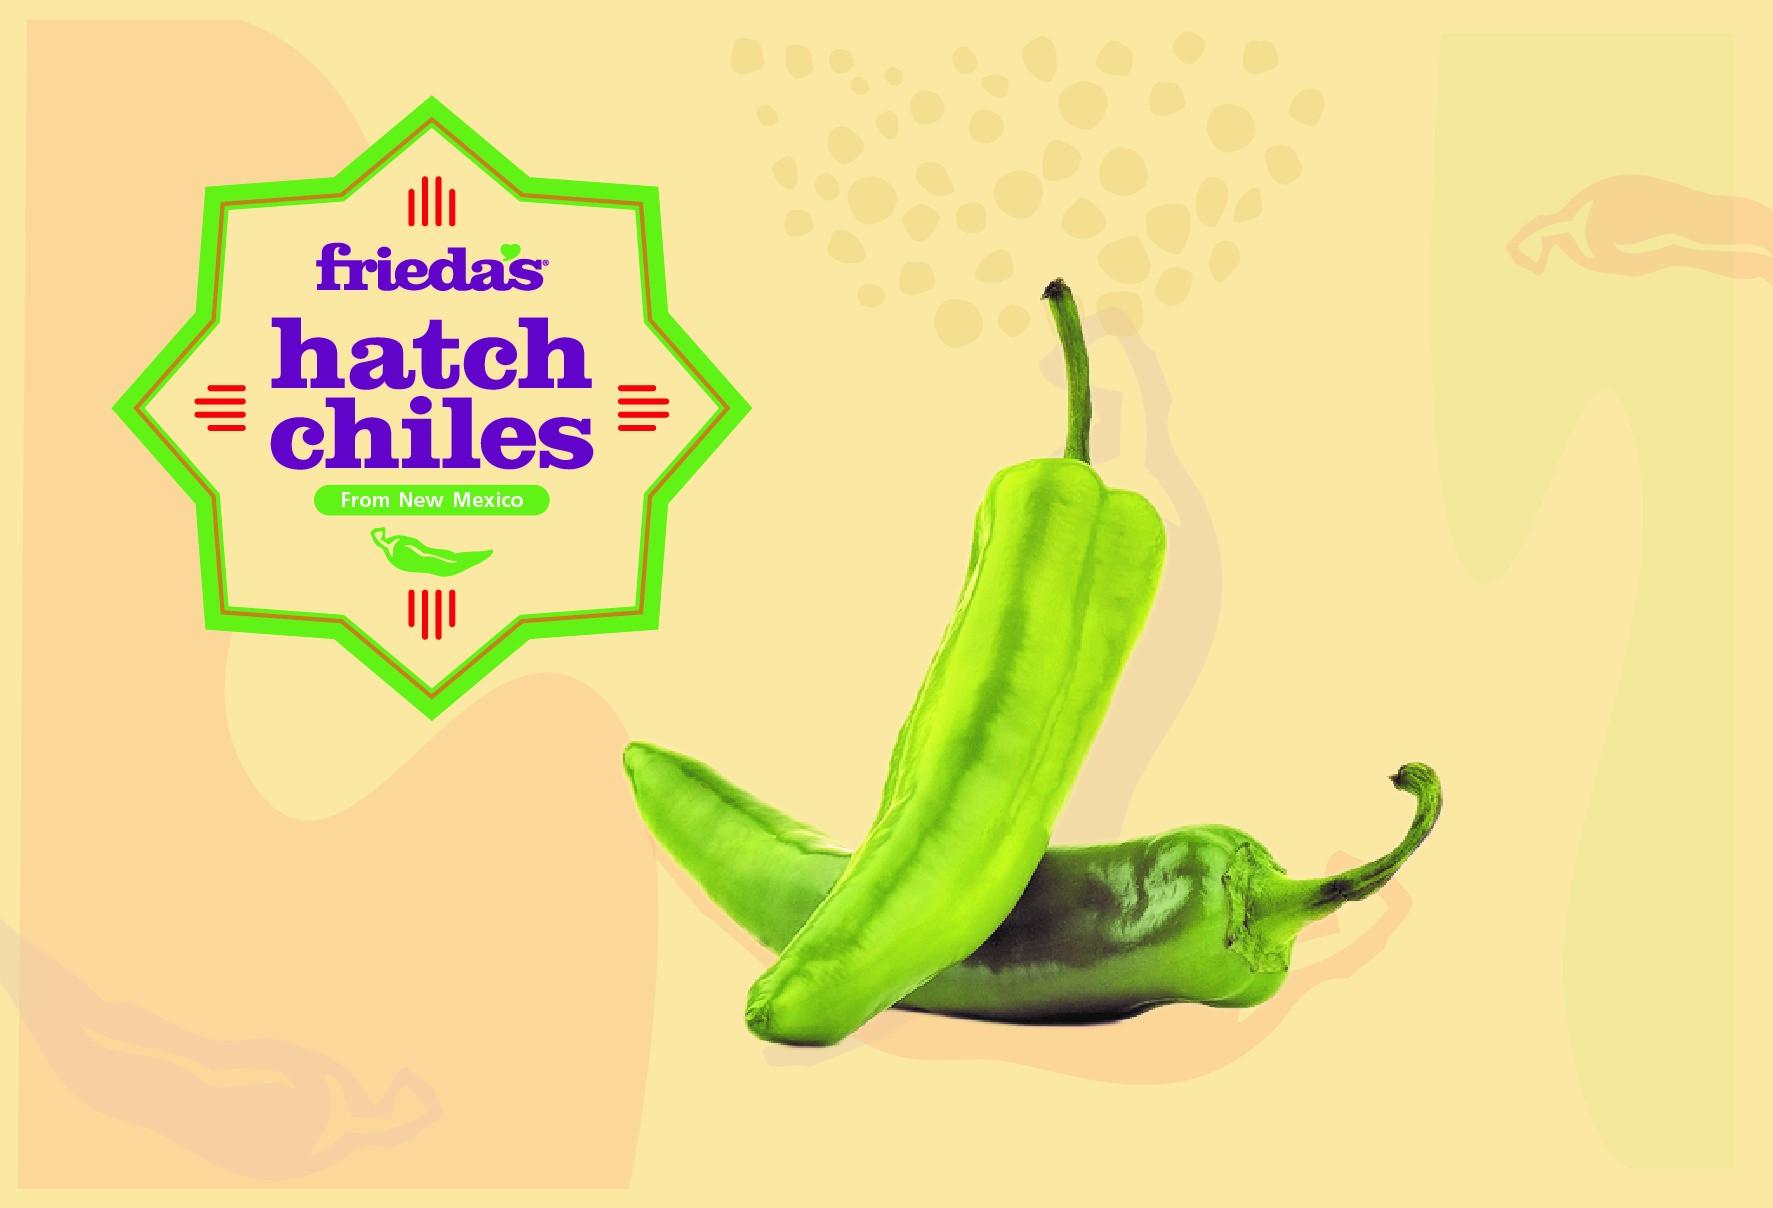 friedas hatch chiles